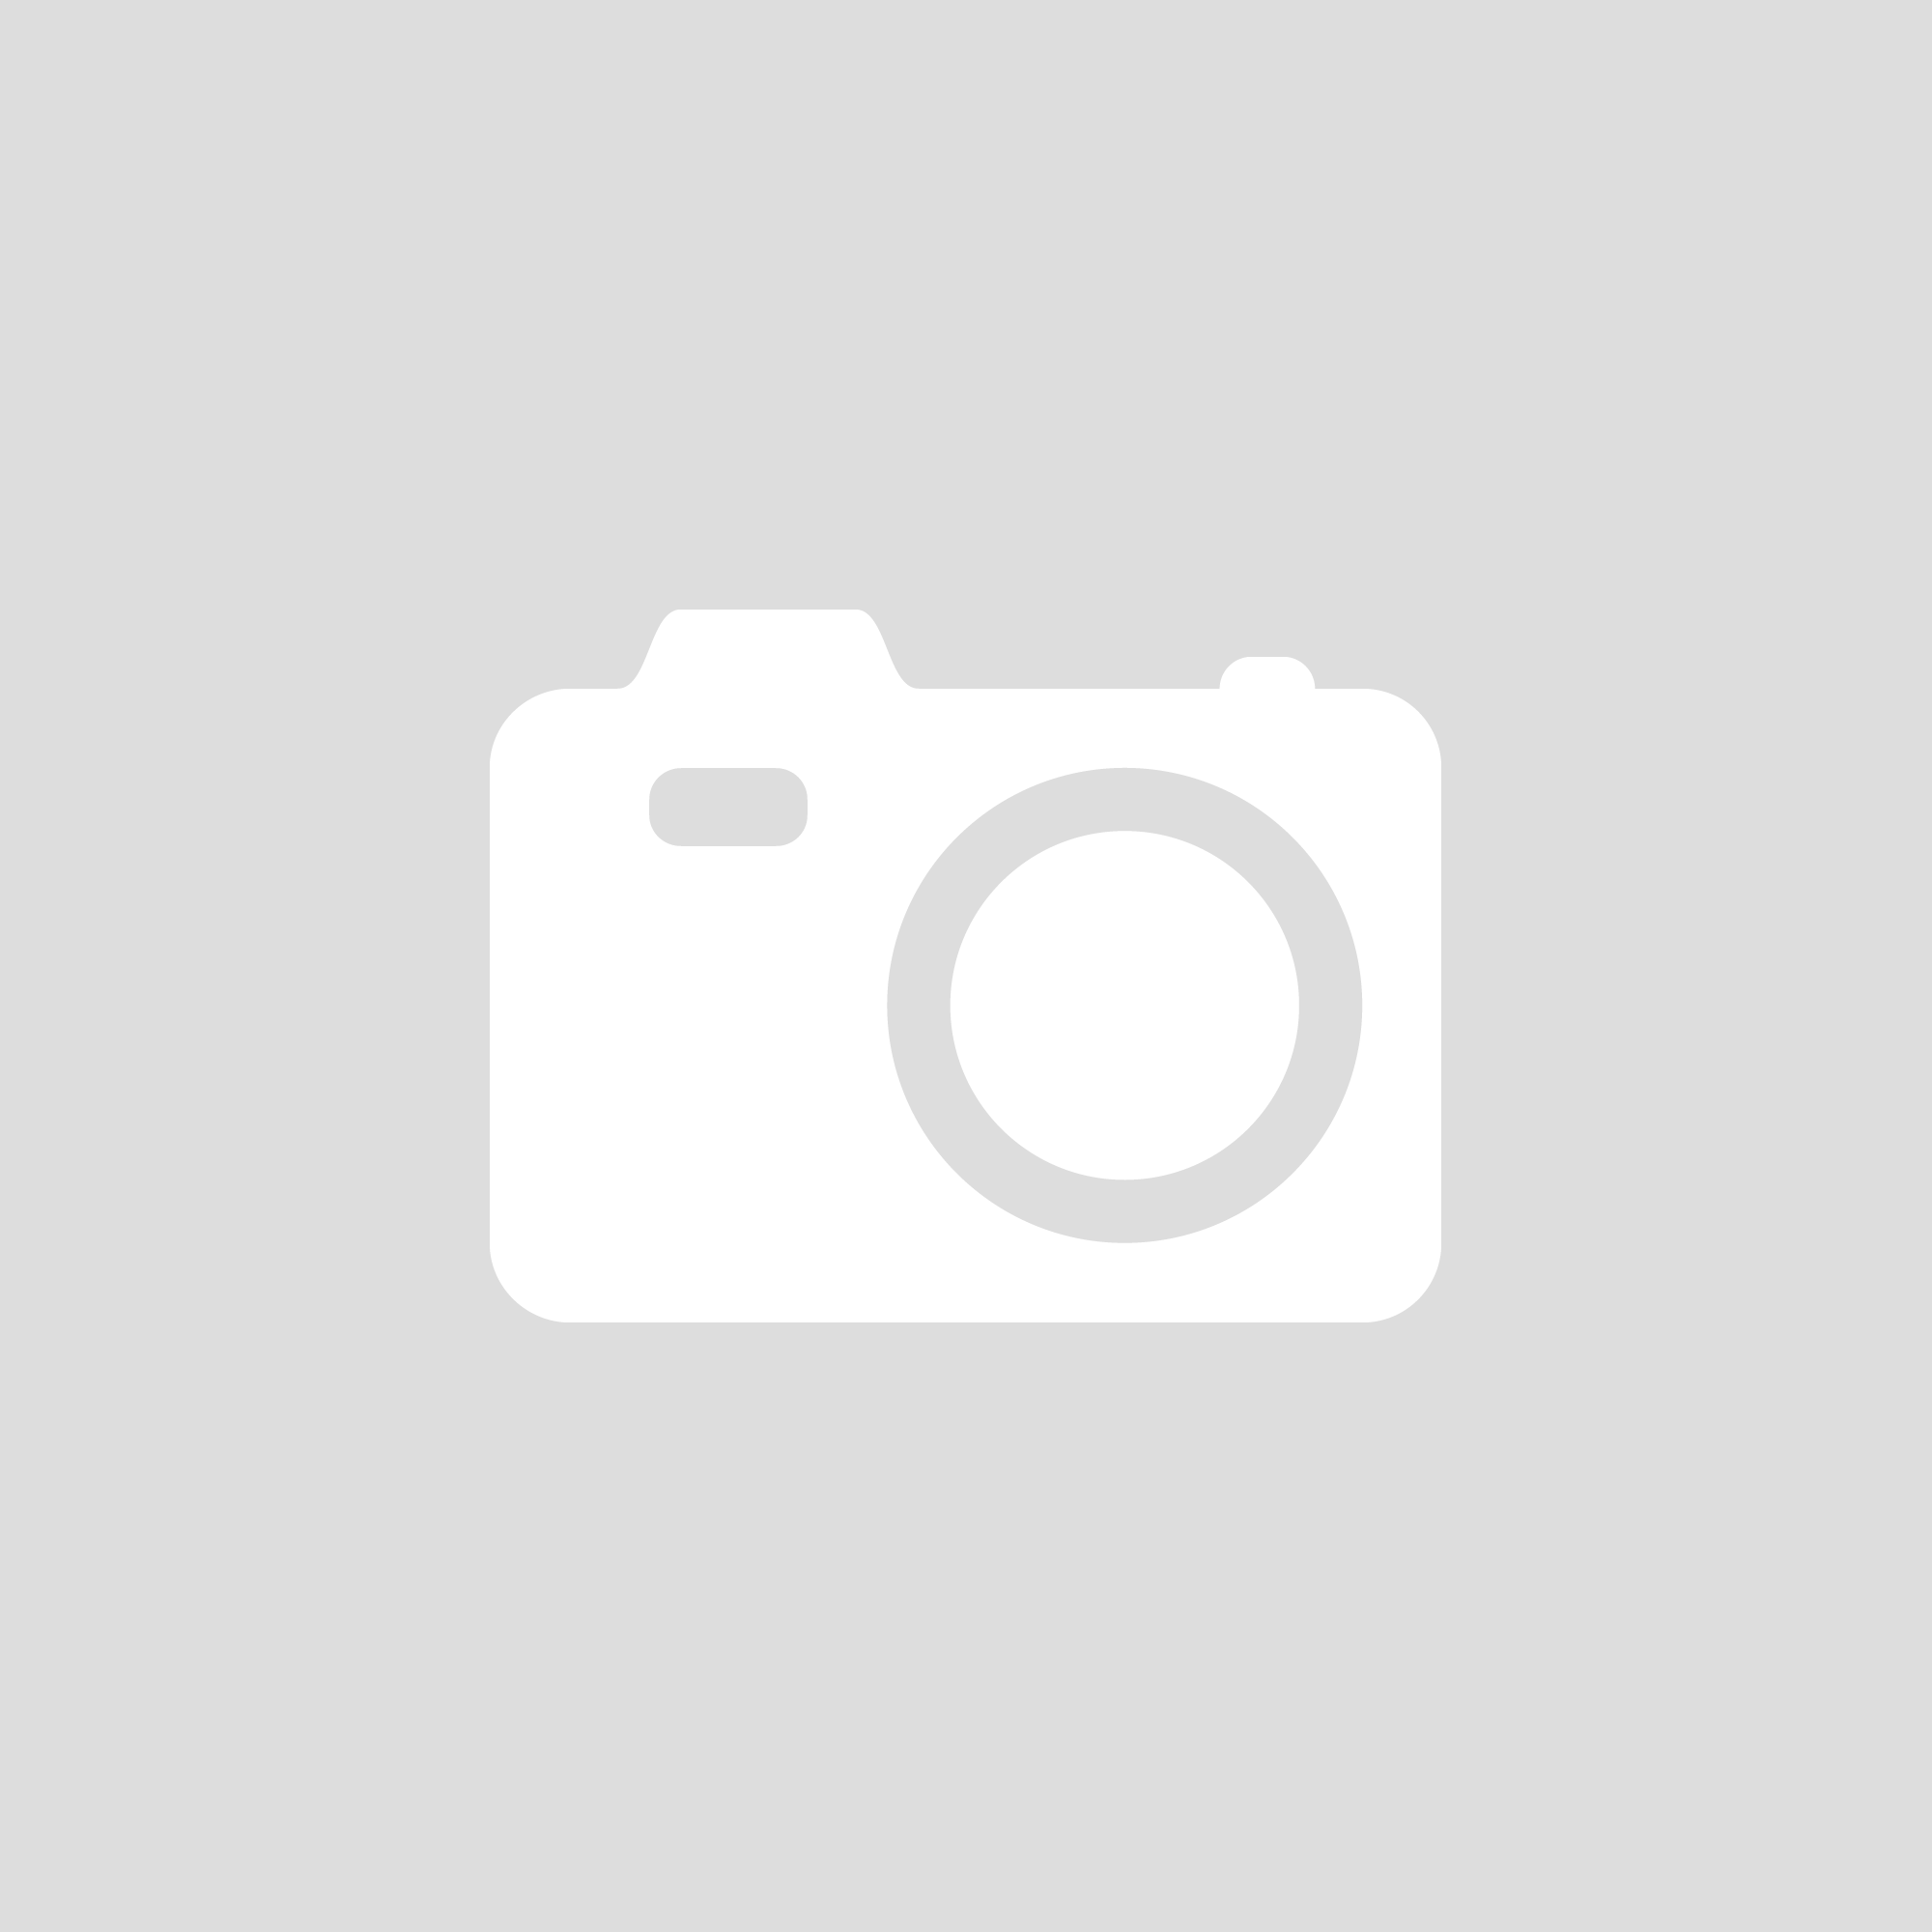 James Retro Starburst Grey / Beige Wallpaper by Albany Conversation 269313